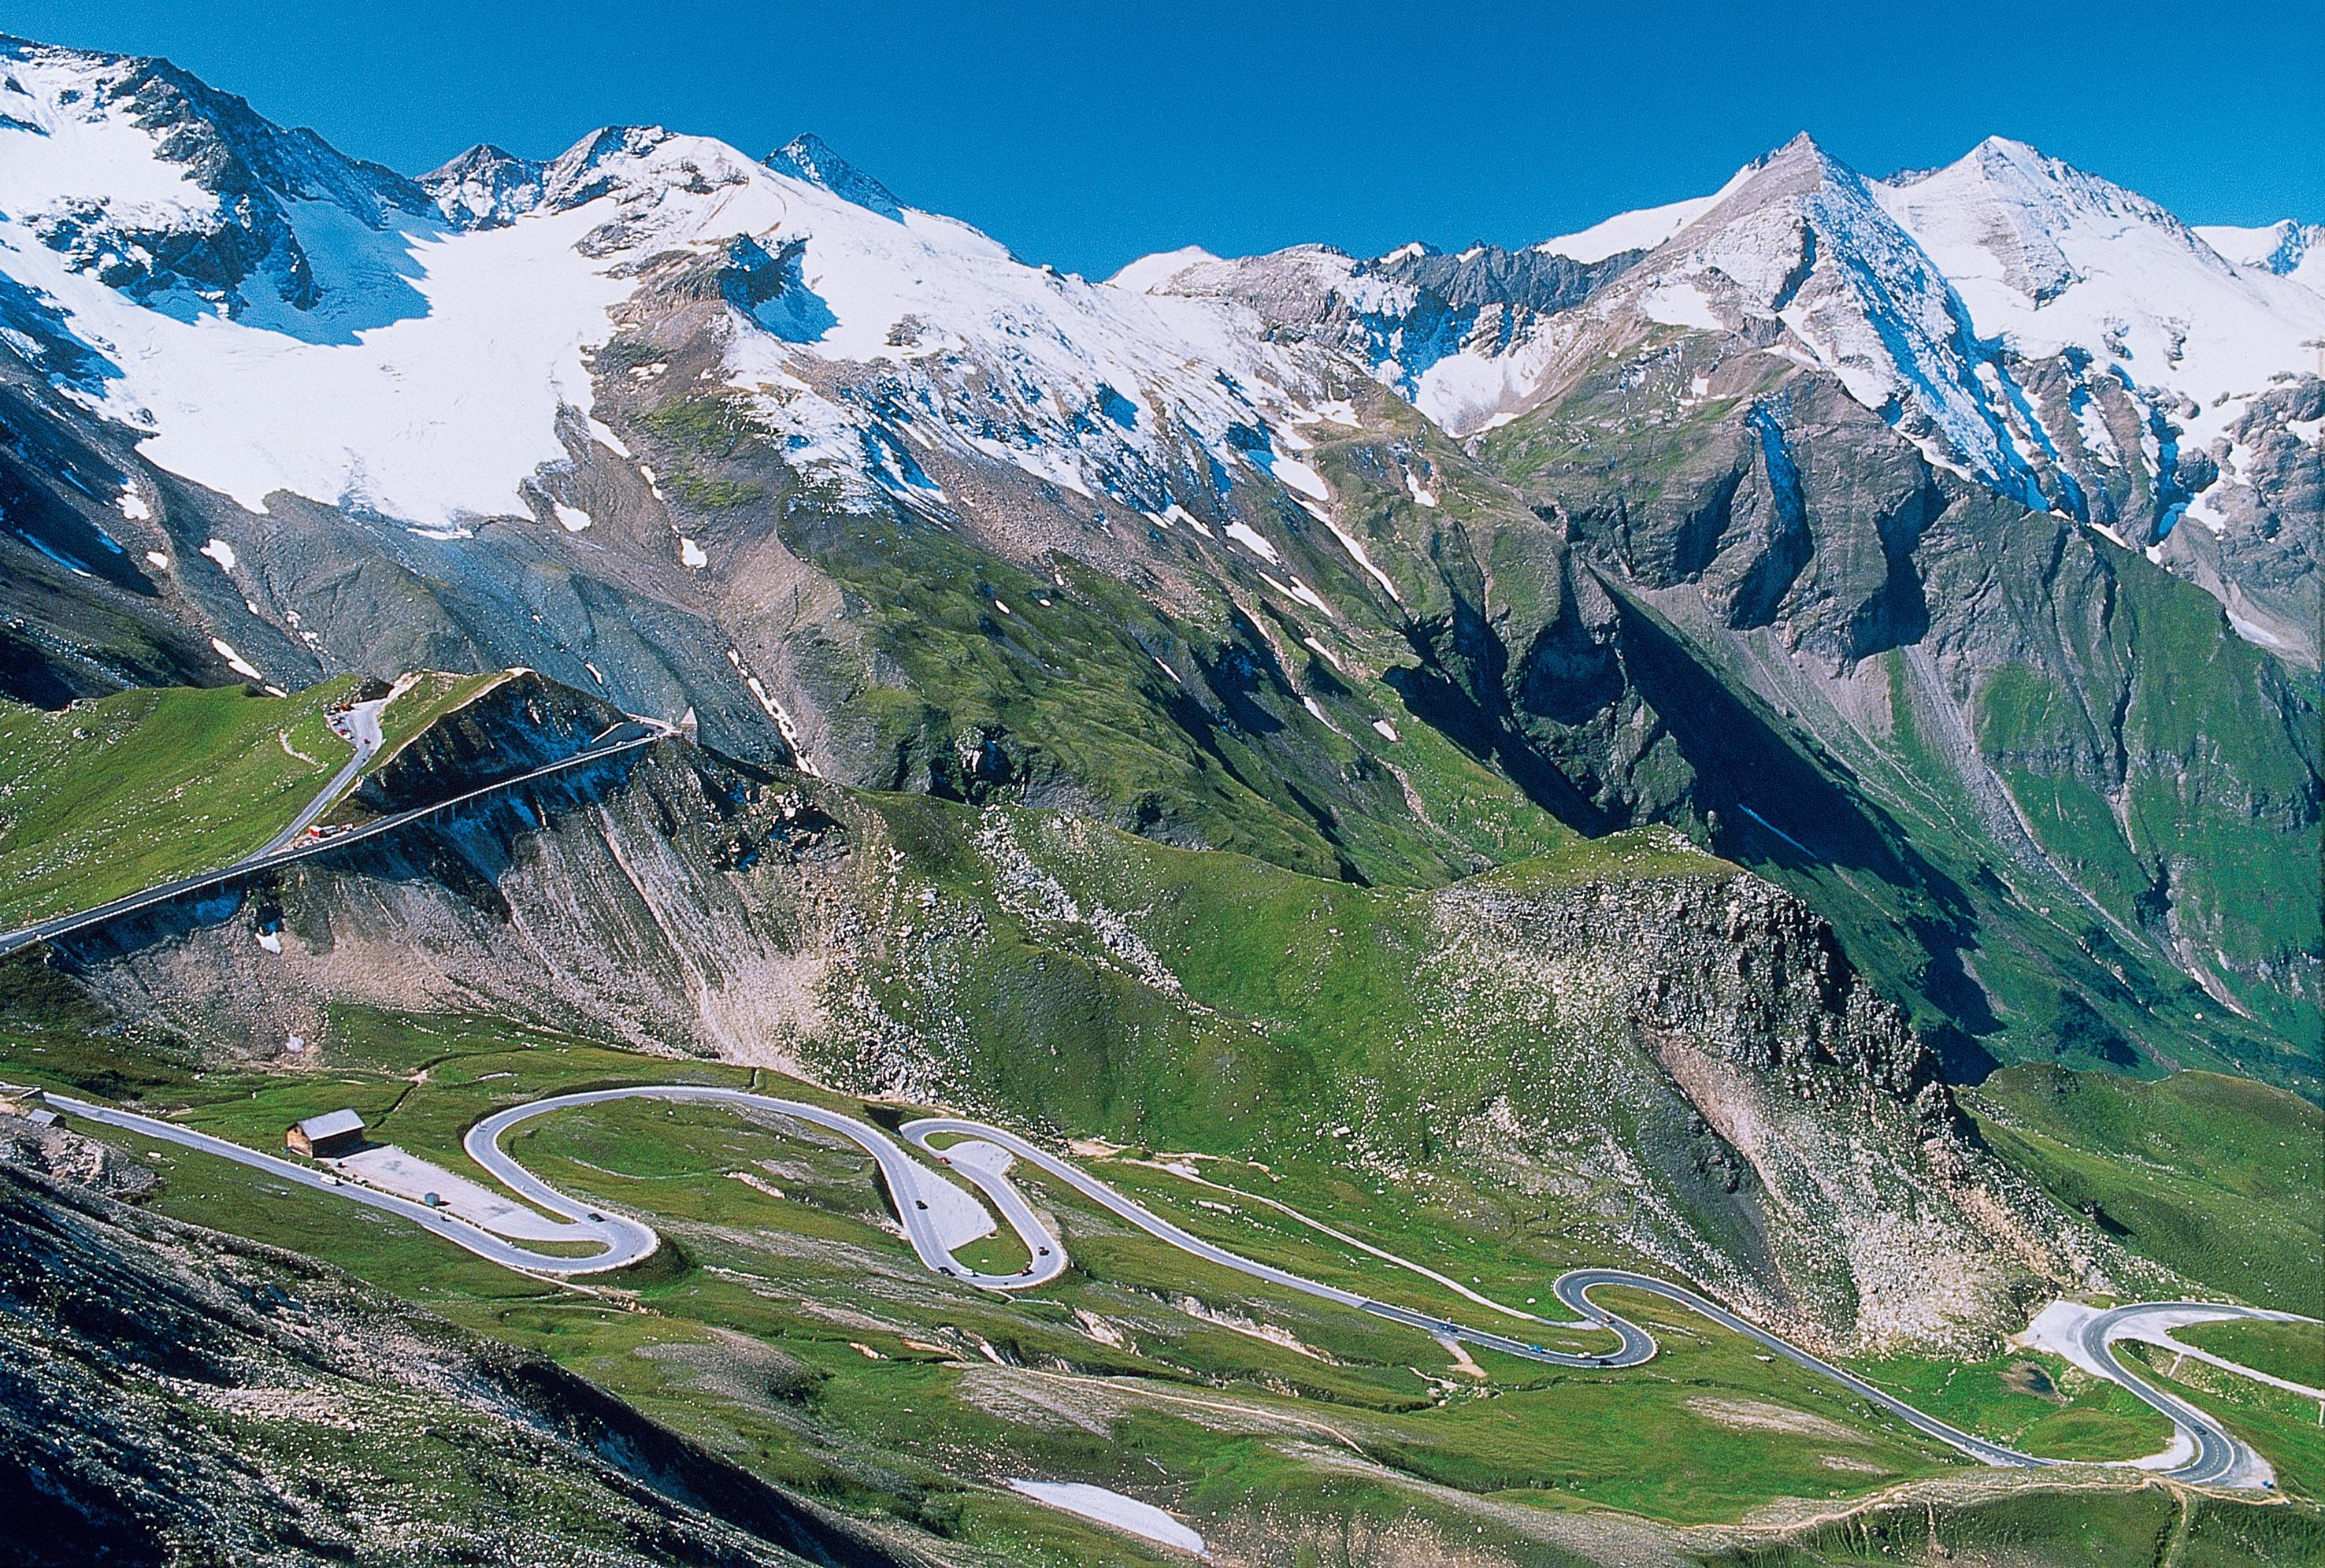 Großglockner High Alpine Road - Zell am See - Kaprun - Arrivalguides.com